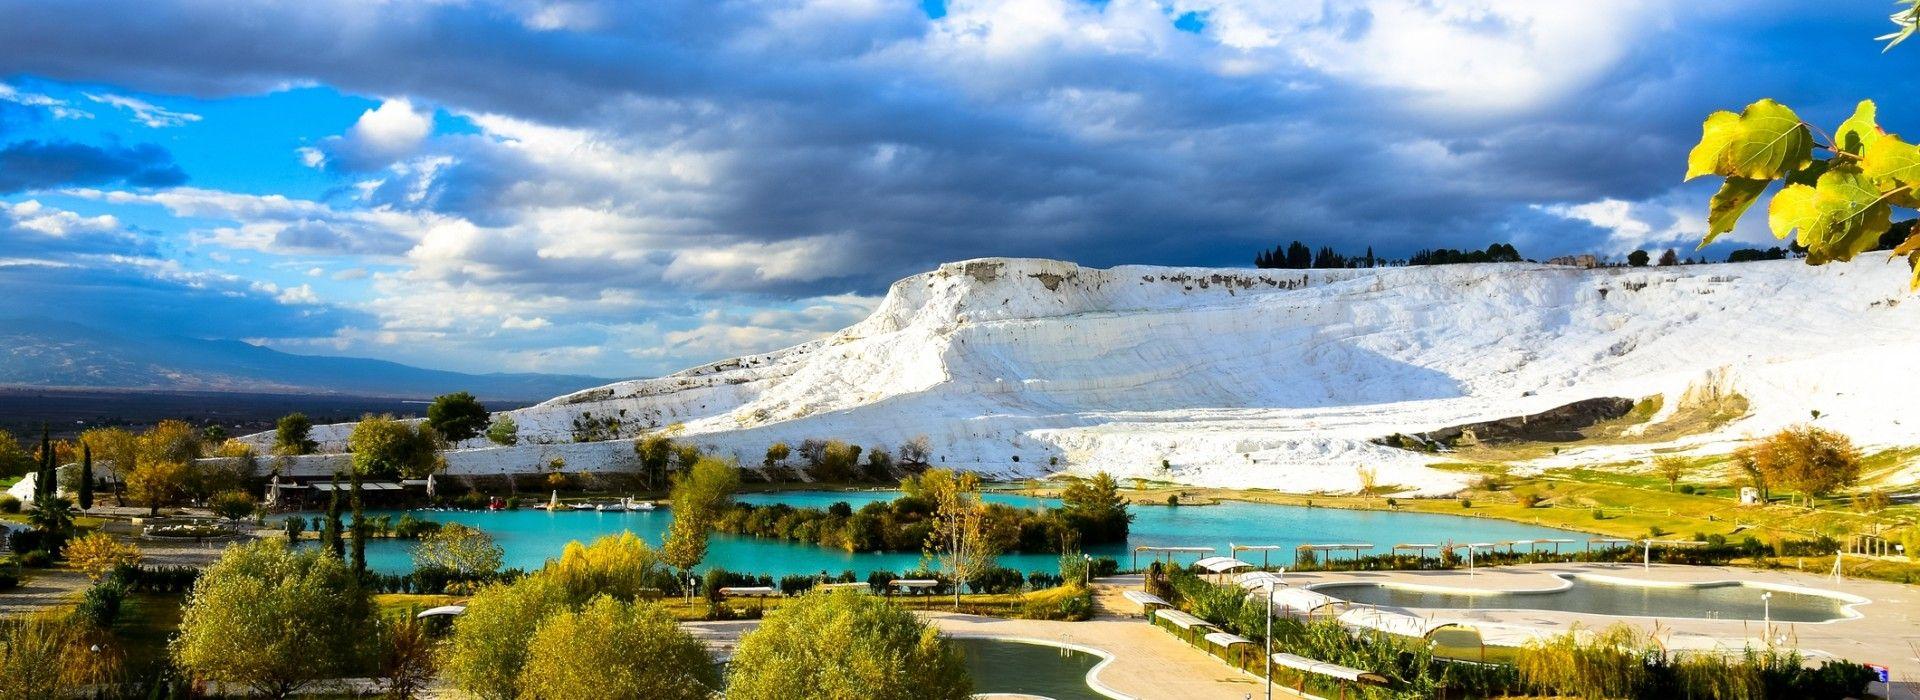 Natural landmarks sightseeing Tours in Fethiye